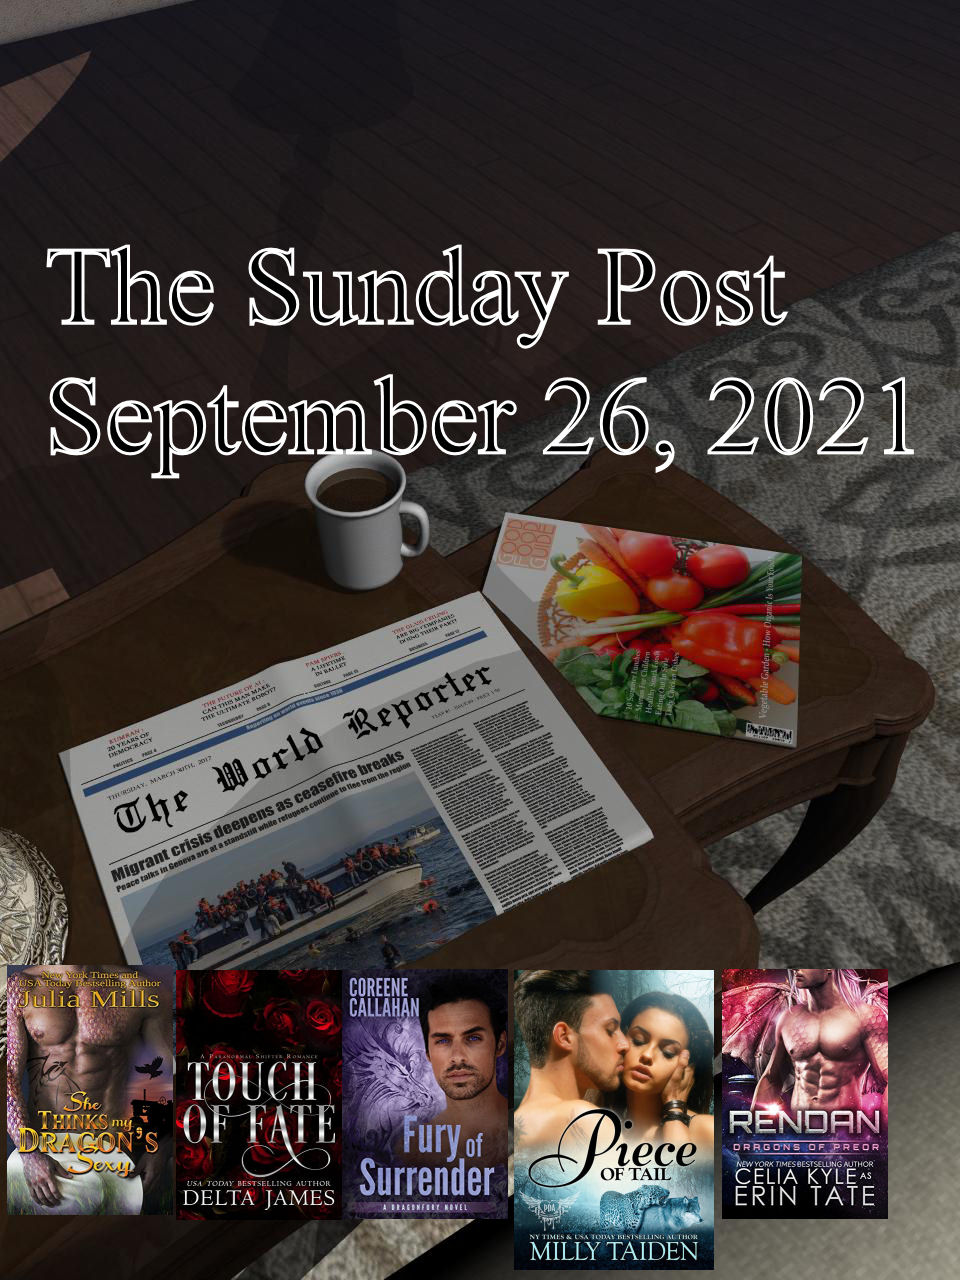 The Sunday Post#21-39